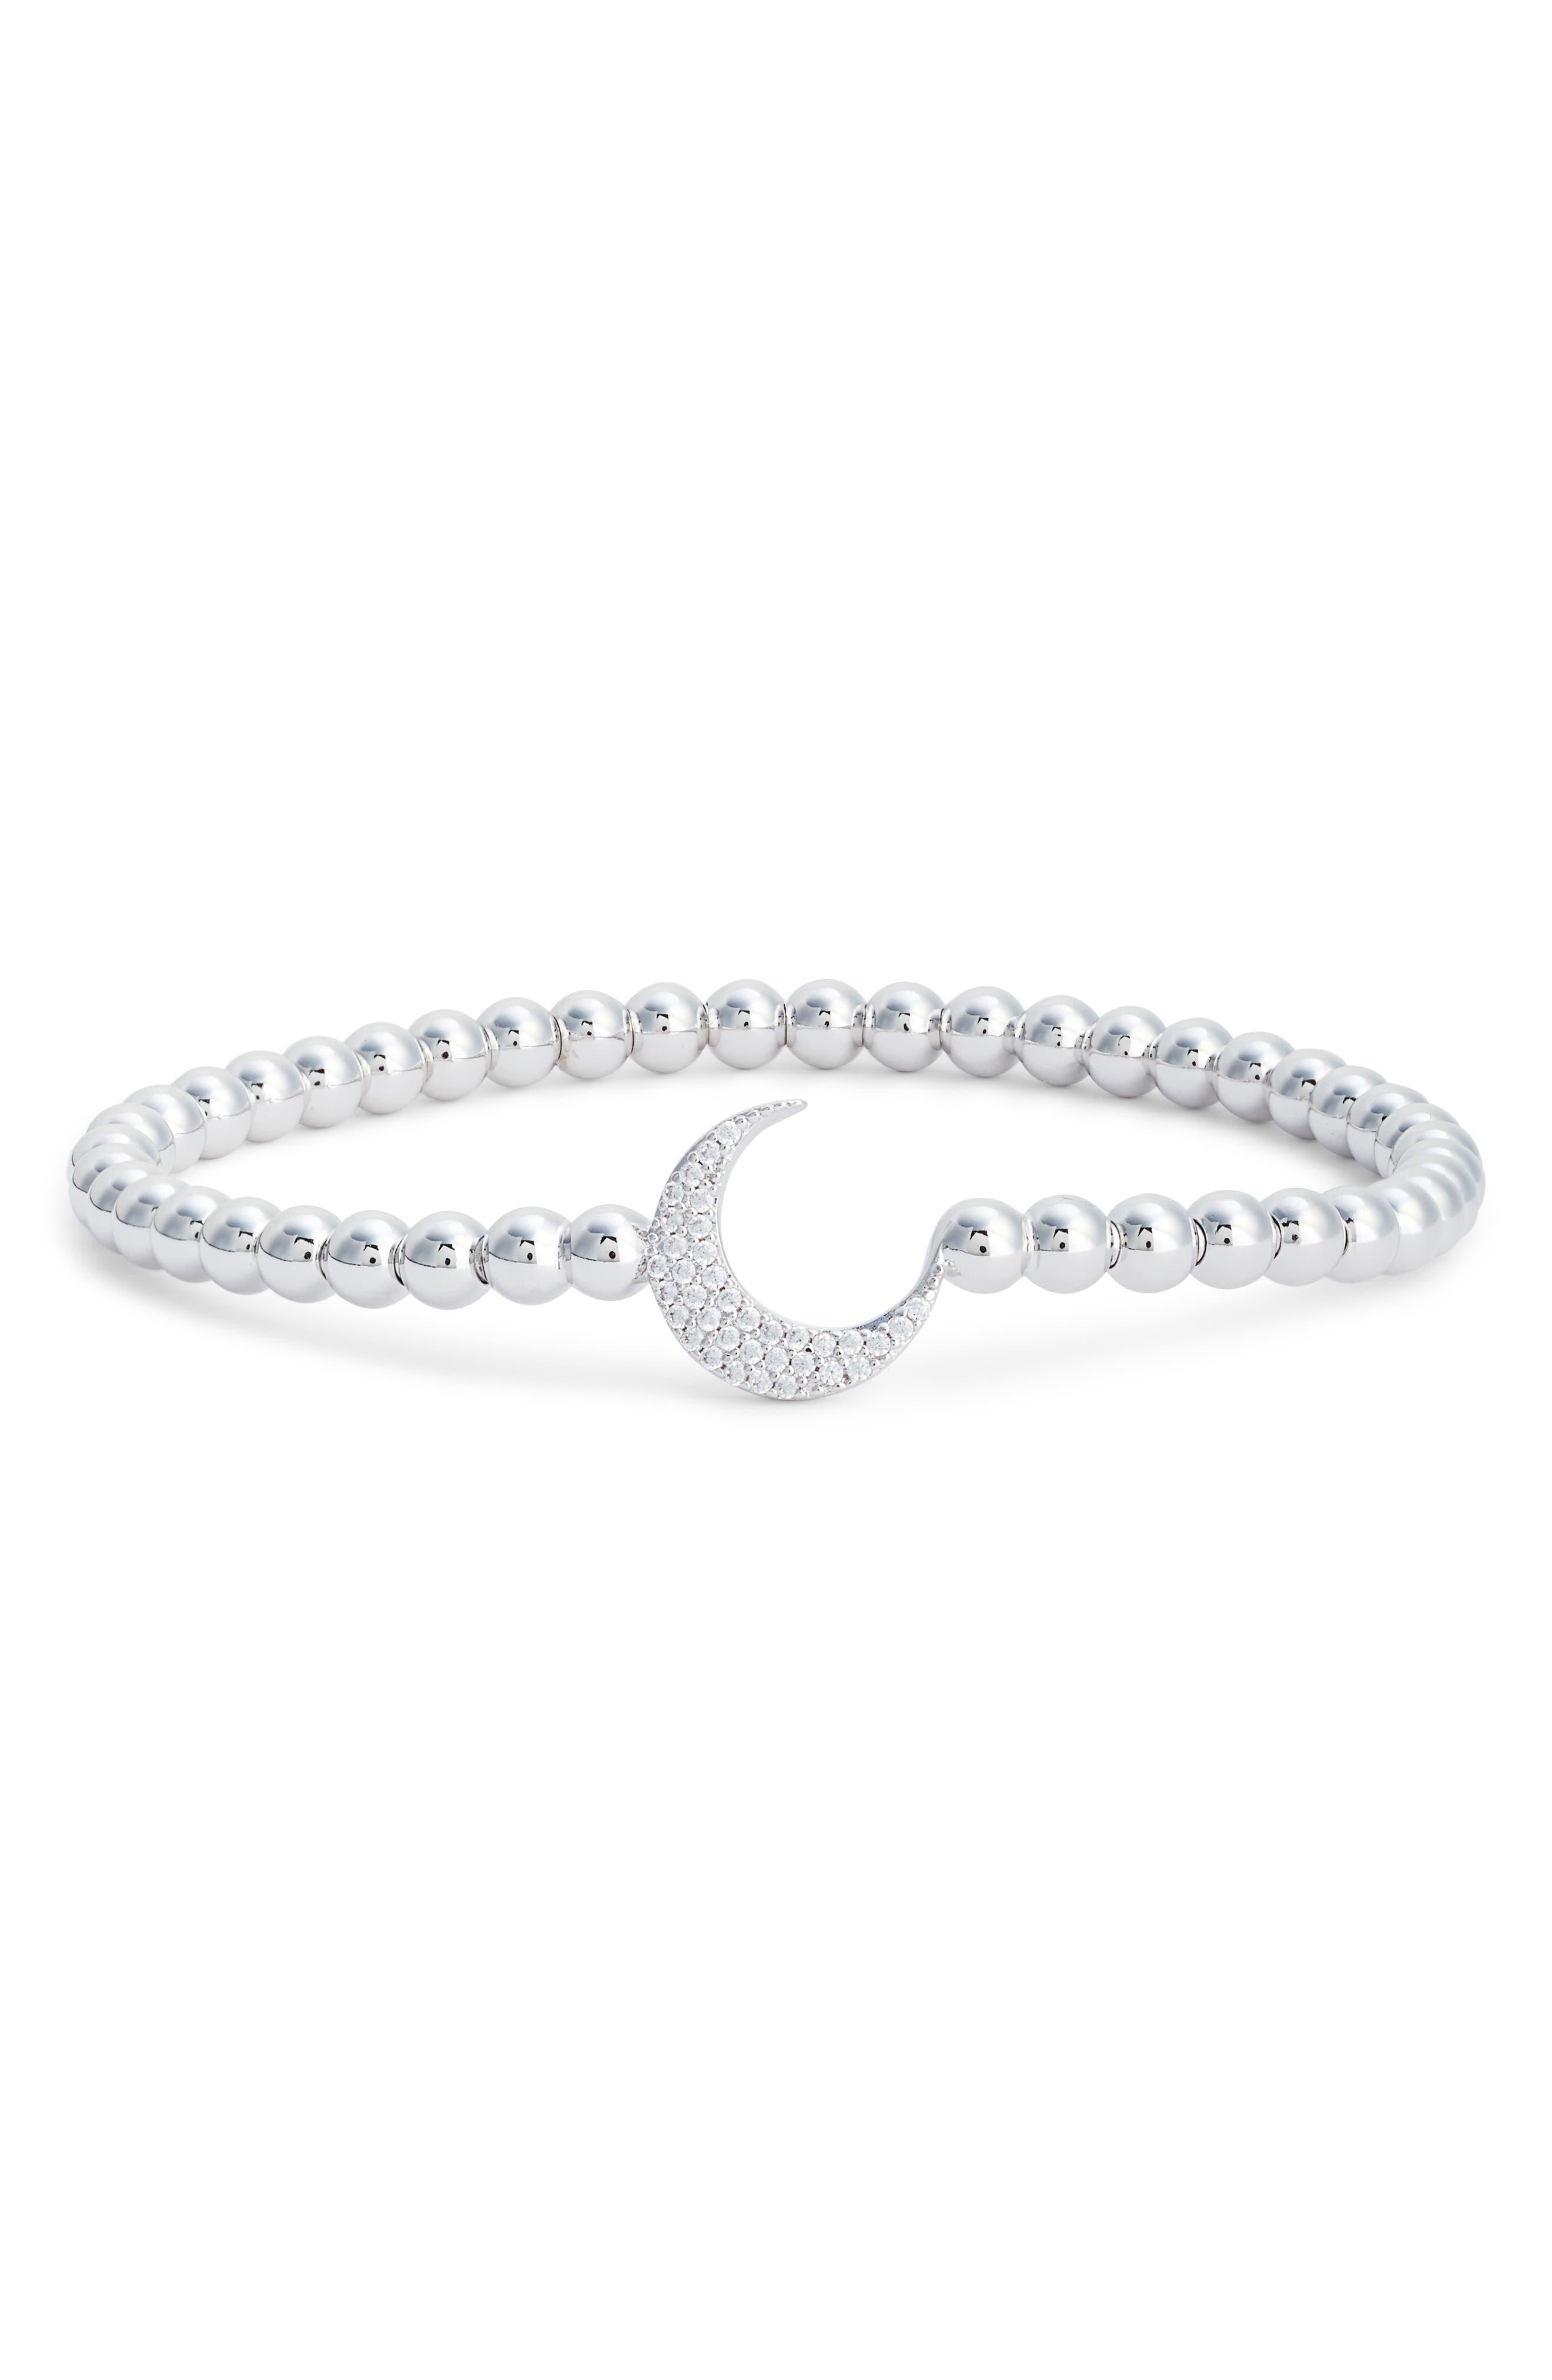 Cubic Zirconia Crescent Moon Circle Bracelet,                             Main thumbnail 1, color,                             SILVER